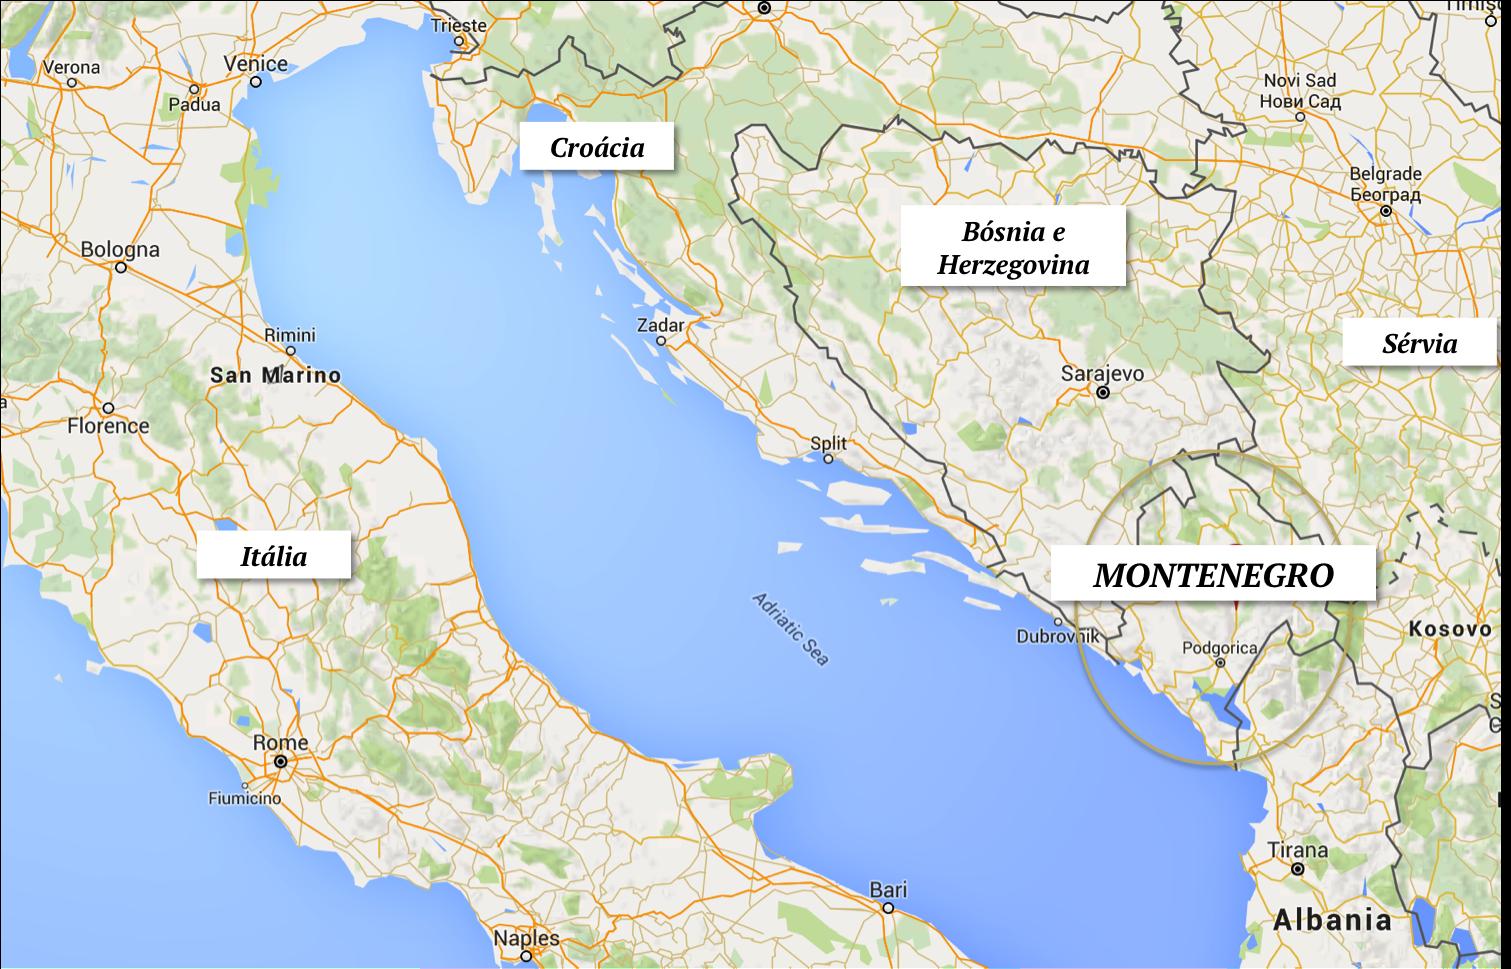 montenegro turismo onde fica localizacao croacia